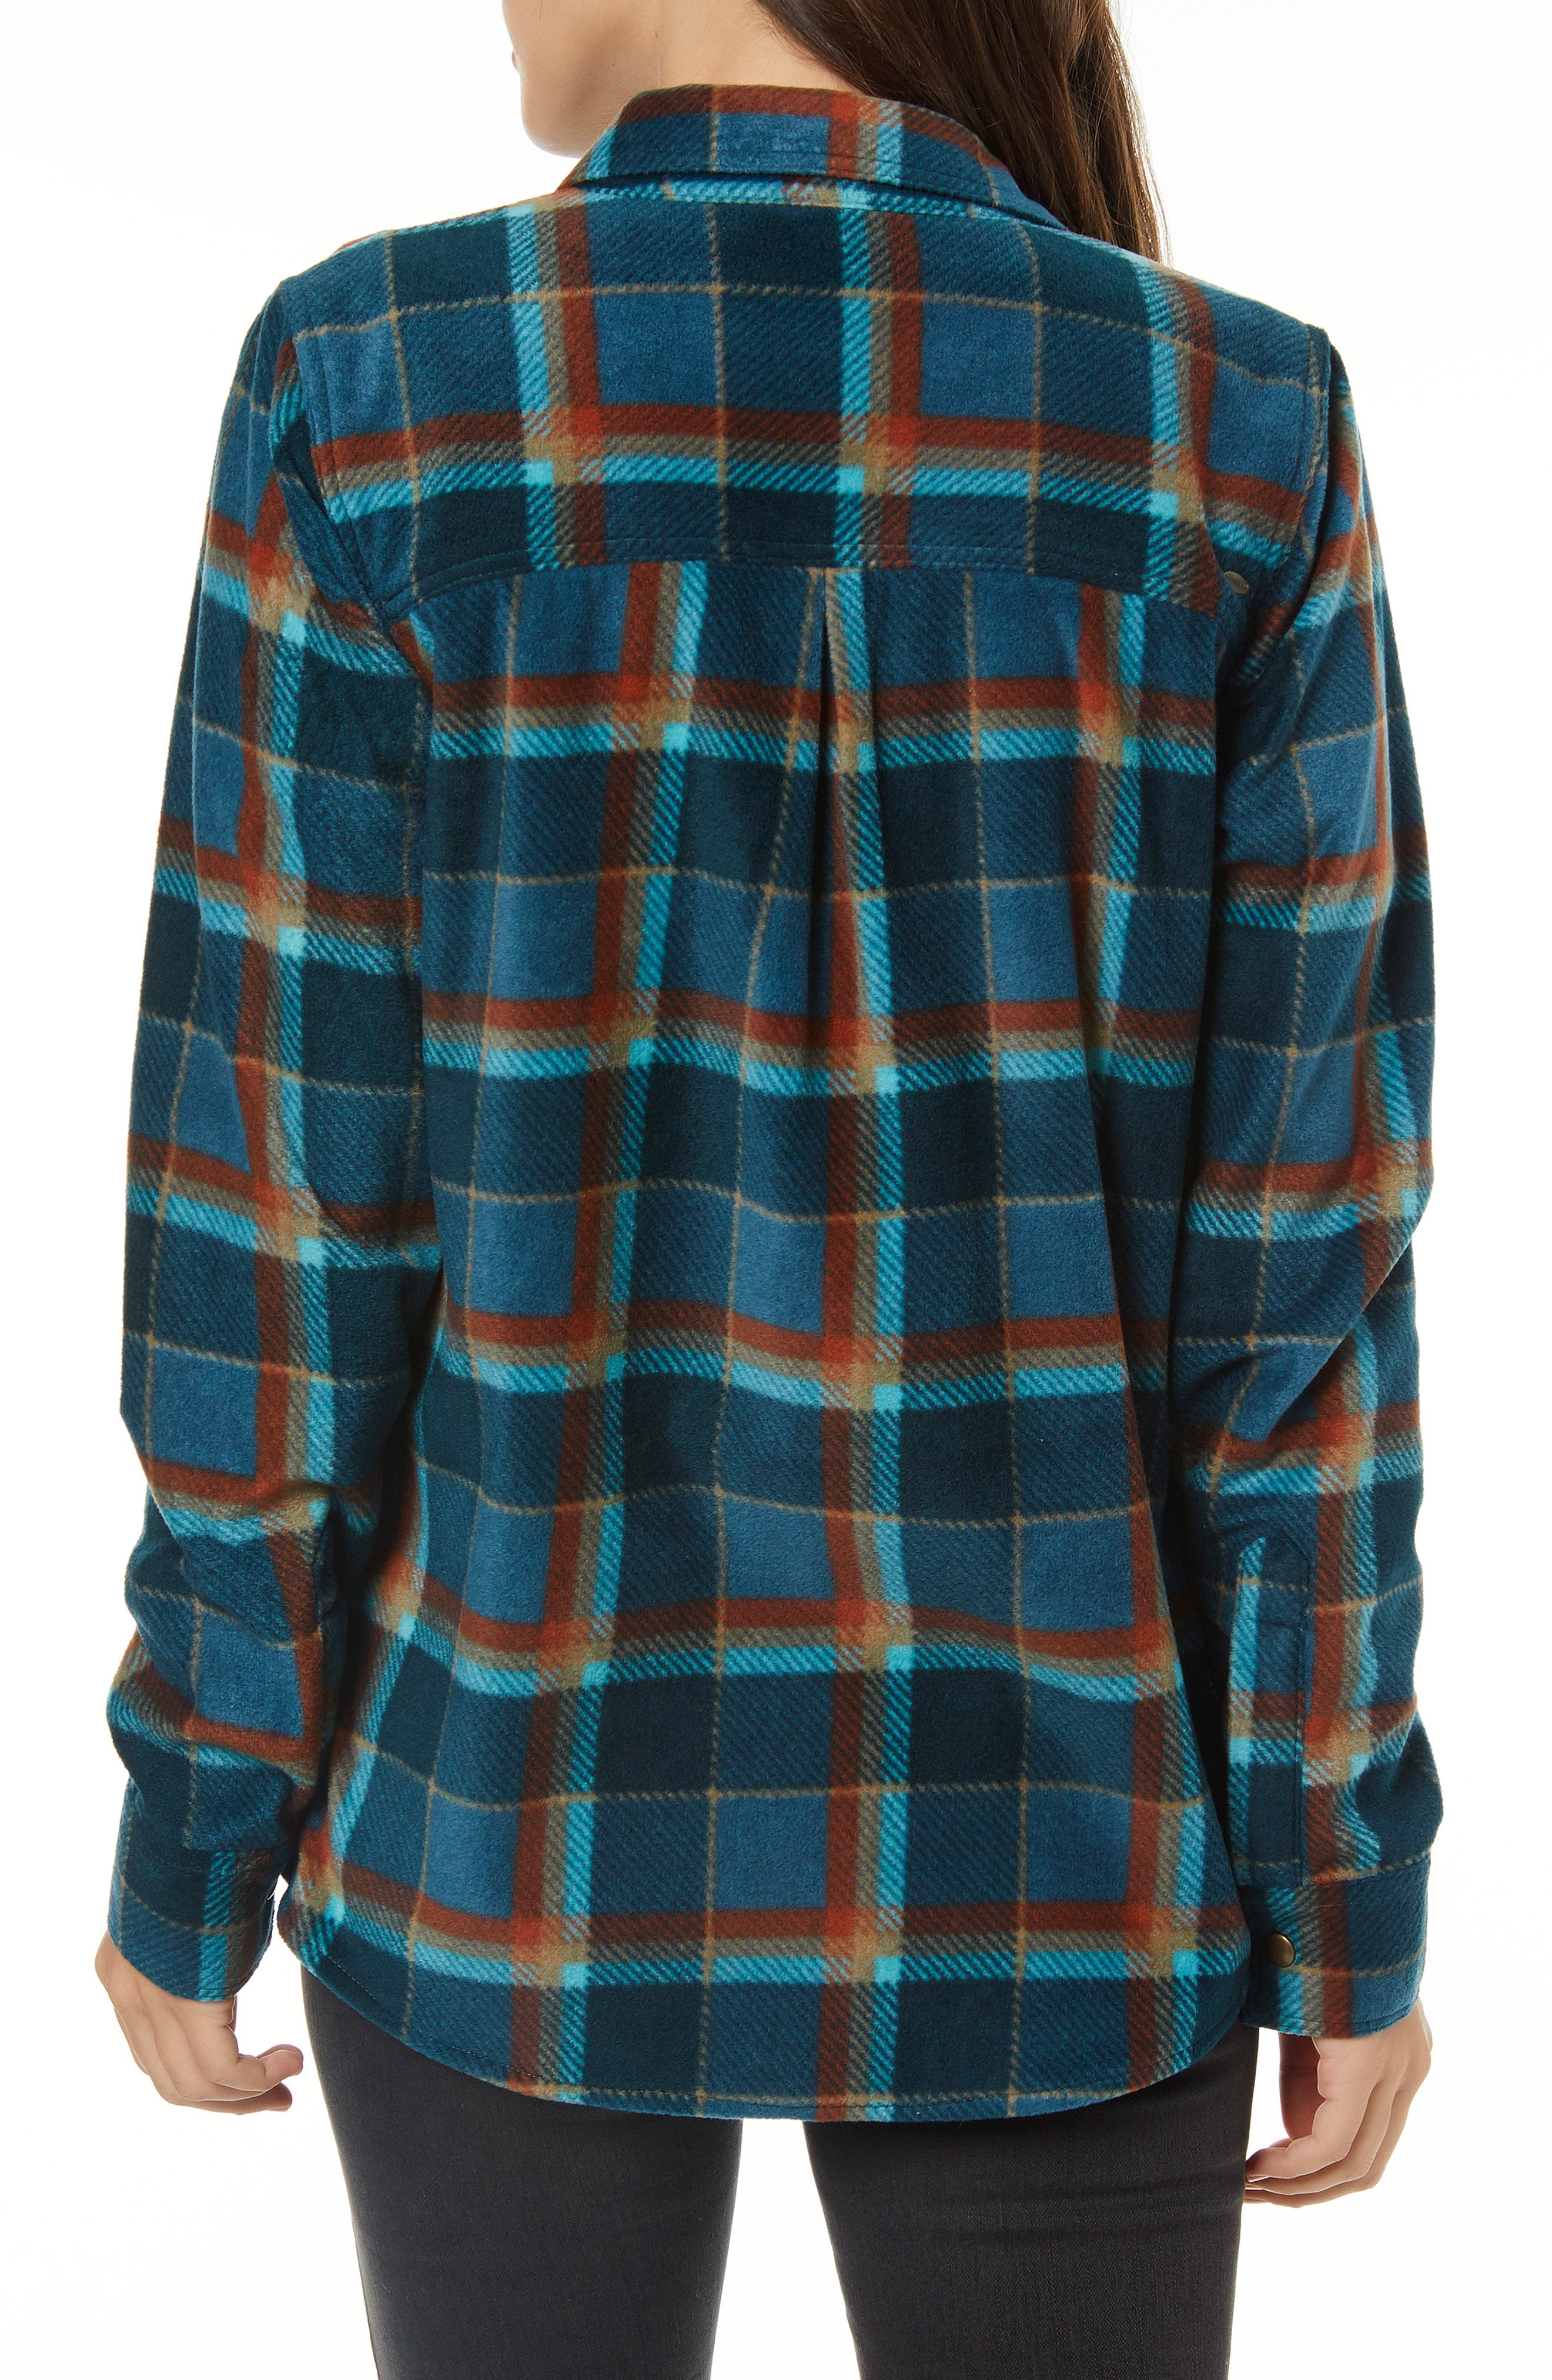 Zuma Plaid Fleece Flannel Shirt,                             Alternate thumbnail 2, color,                             DEEP TEAL